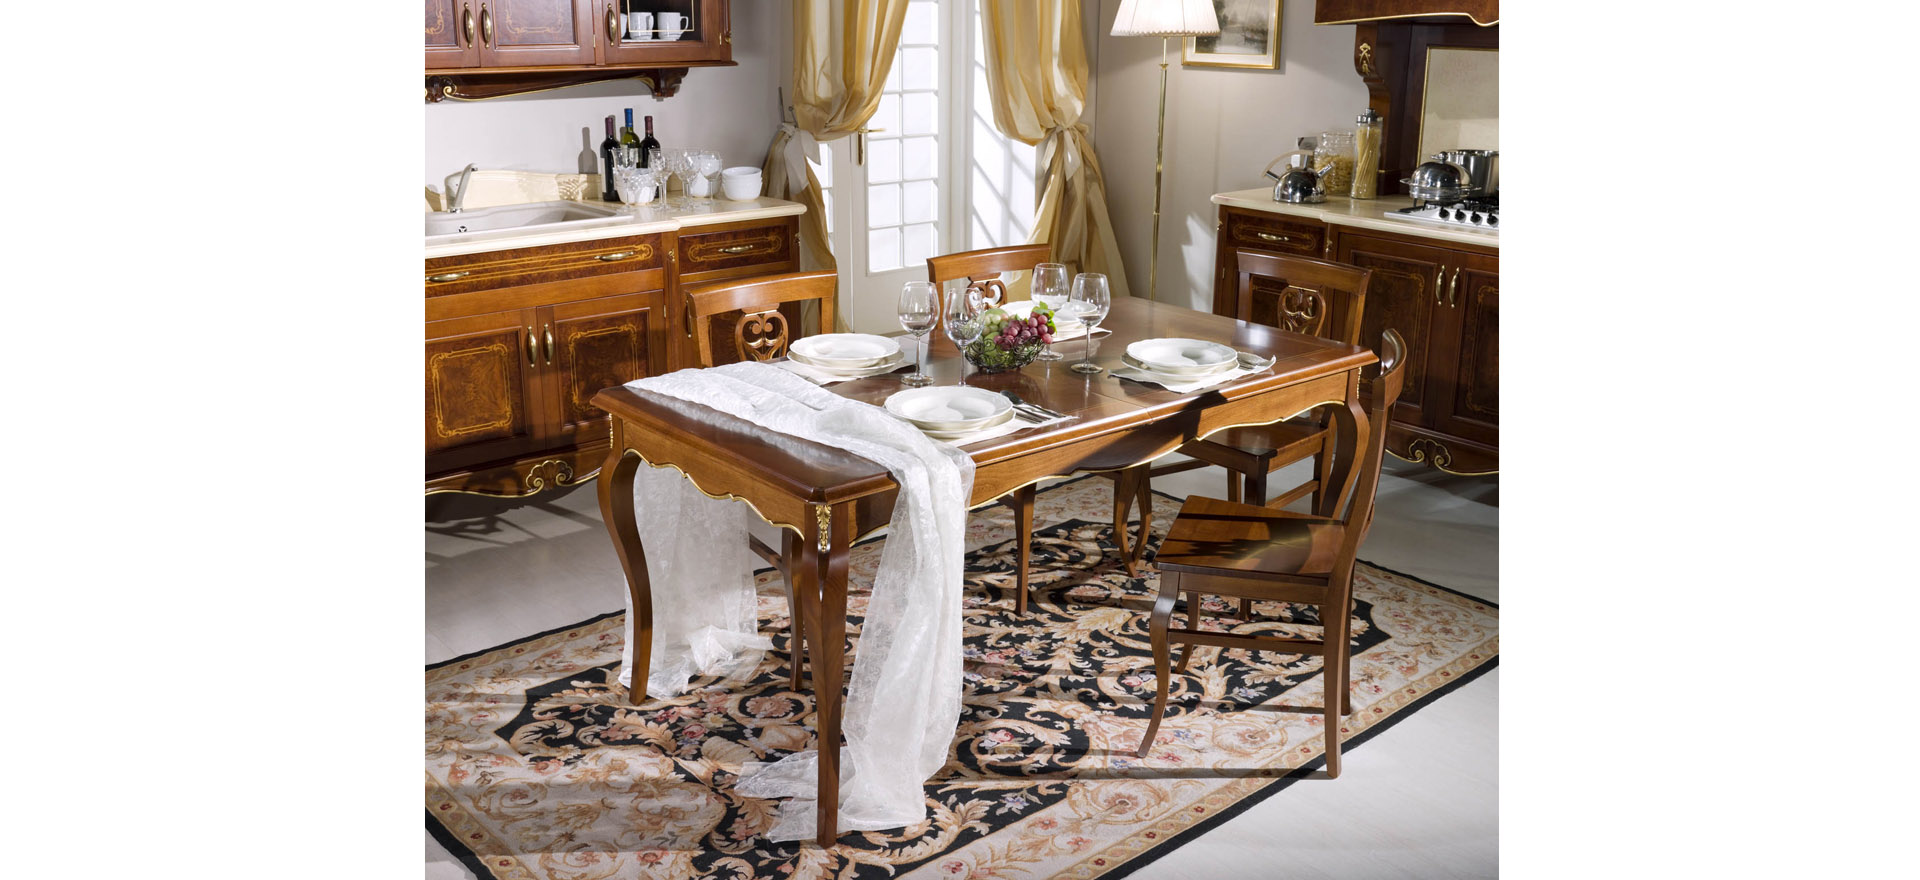 cucina-rondo-tavolo